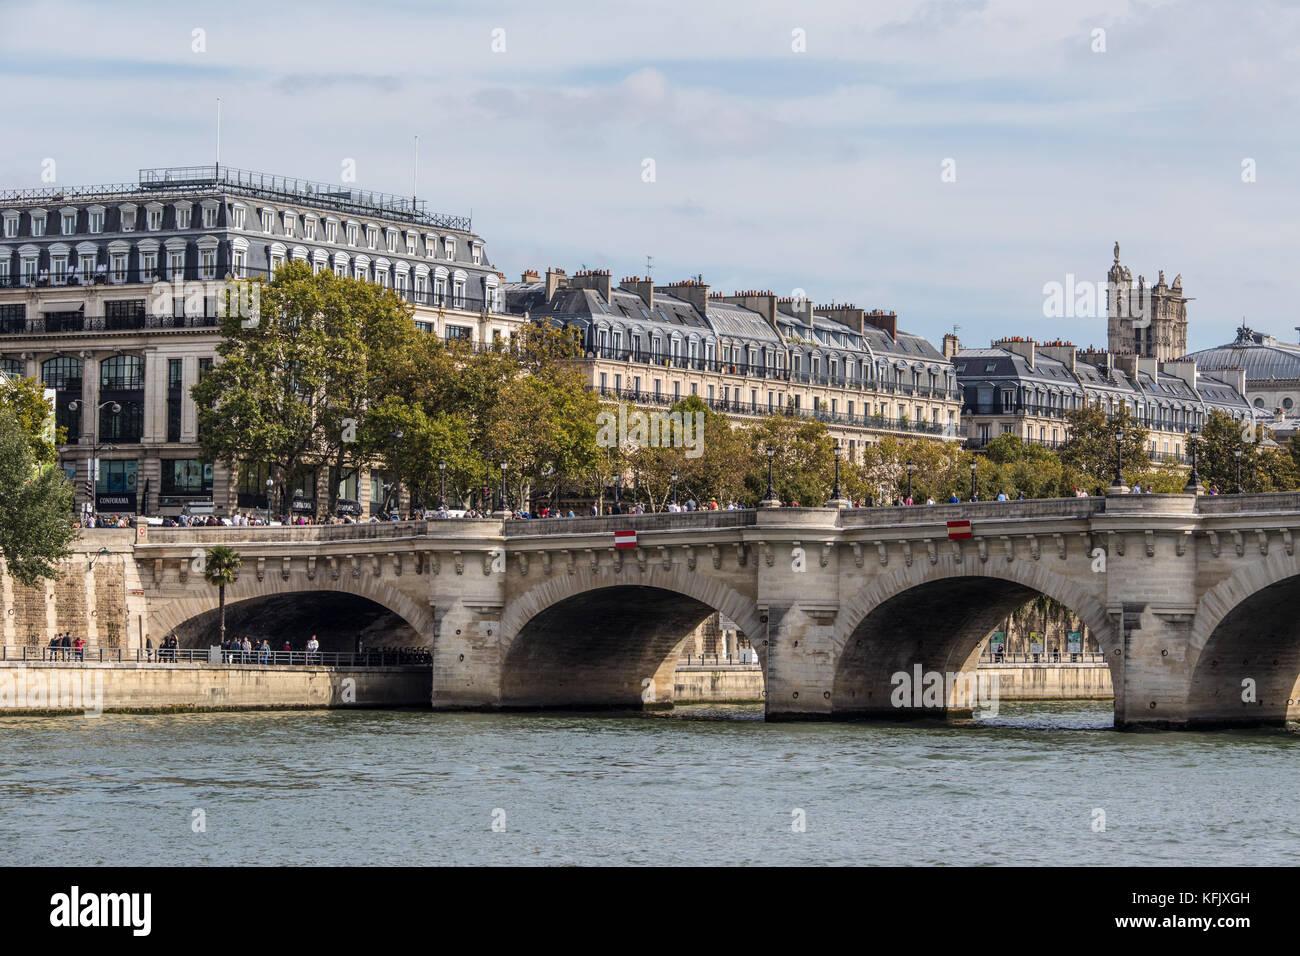 Pont Neuf, River Seine, Paris, France - Stock Image